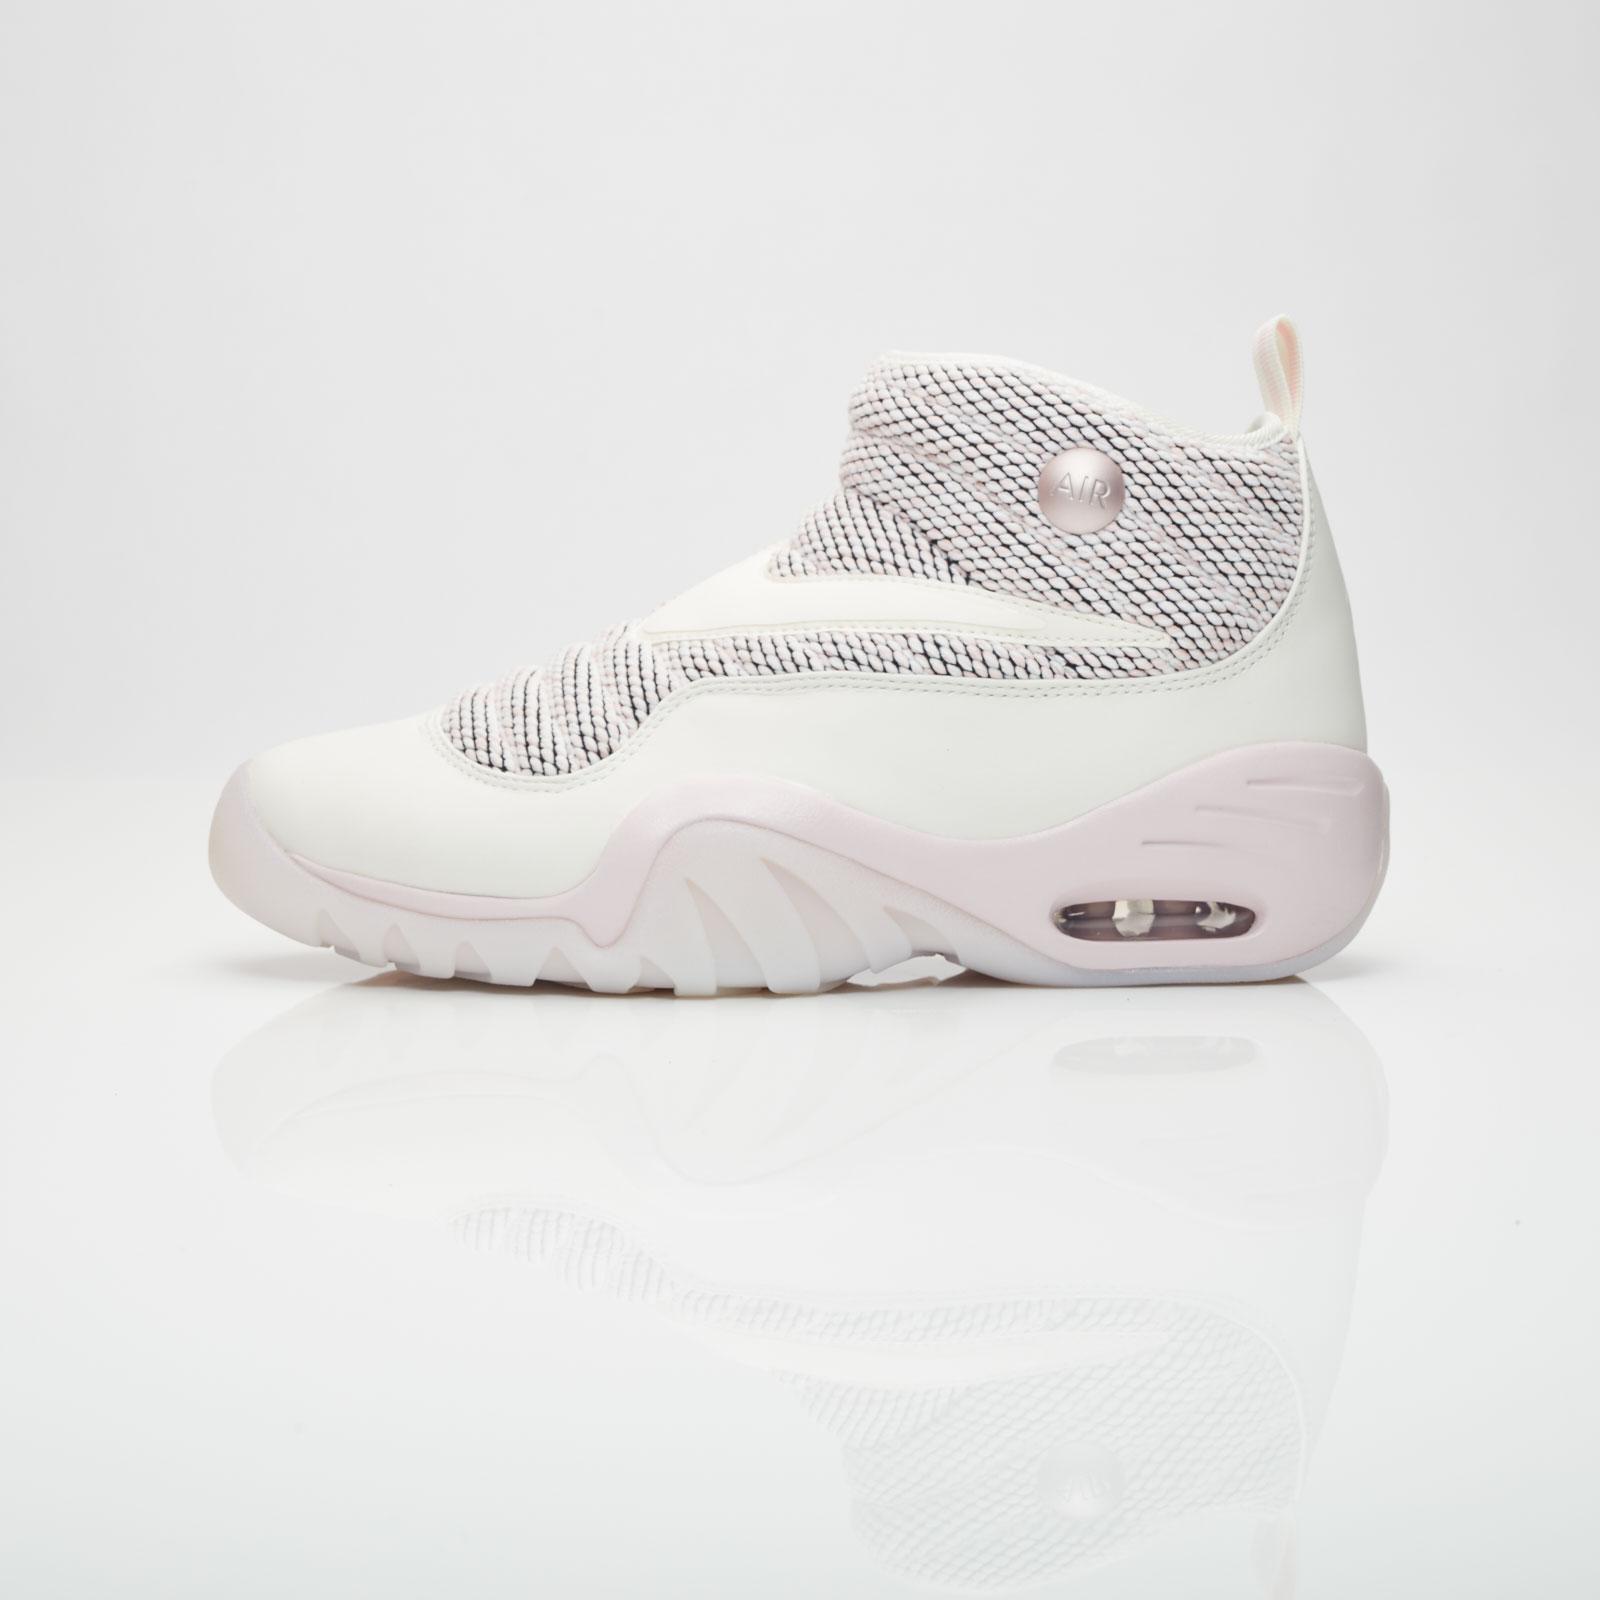 6dc825ba095e Nike Air Shake Ndestrukt   Pigalle - Aa4315-100 - Sneakersnstuff ...